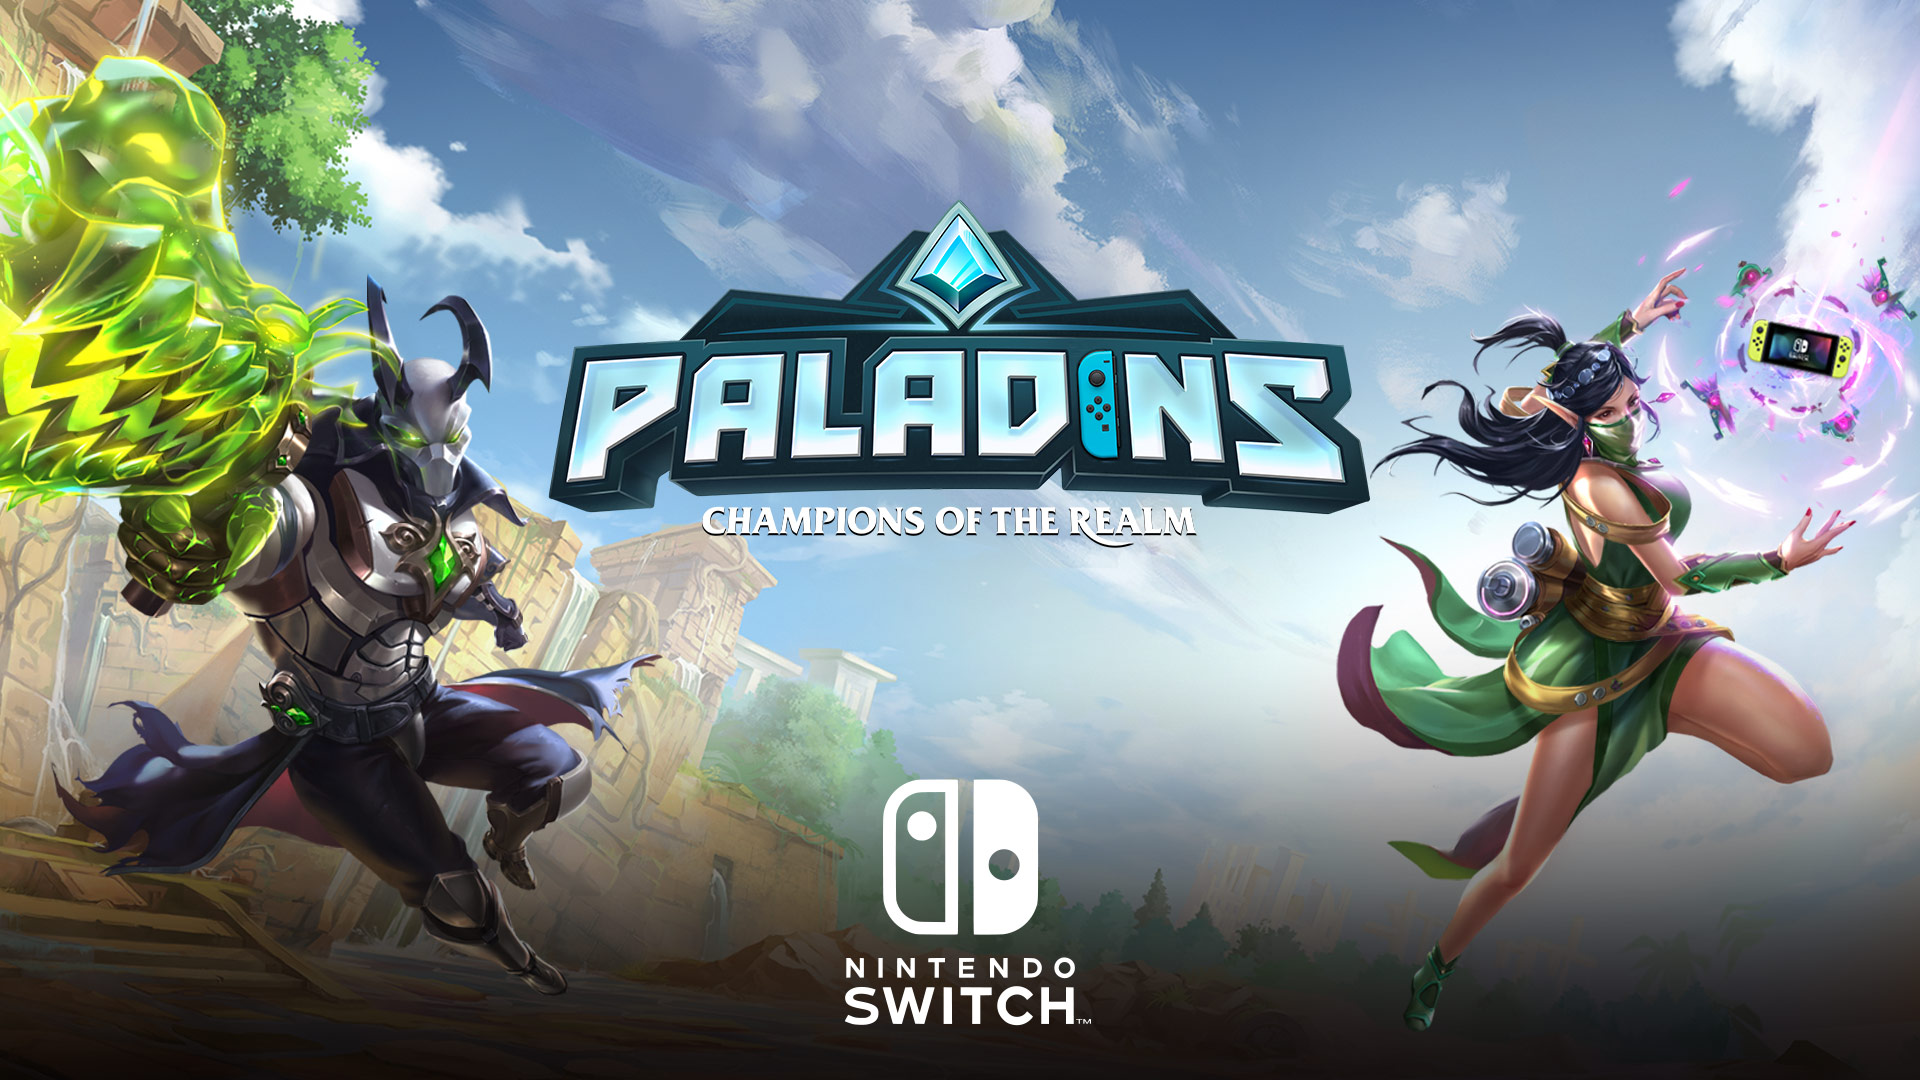 Paladins_Nintendo_Switch_1920x1080